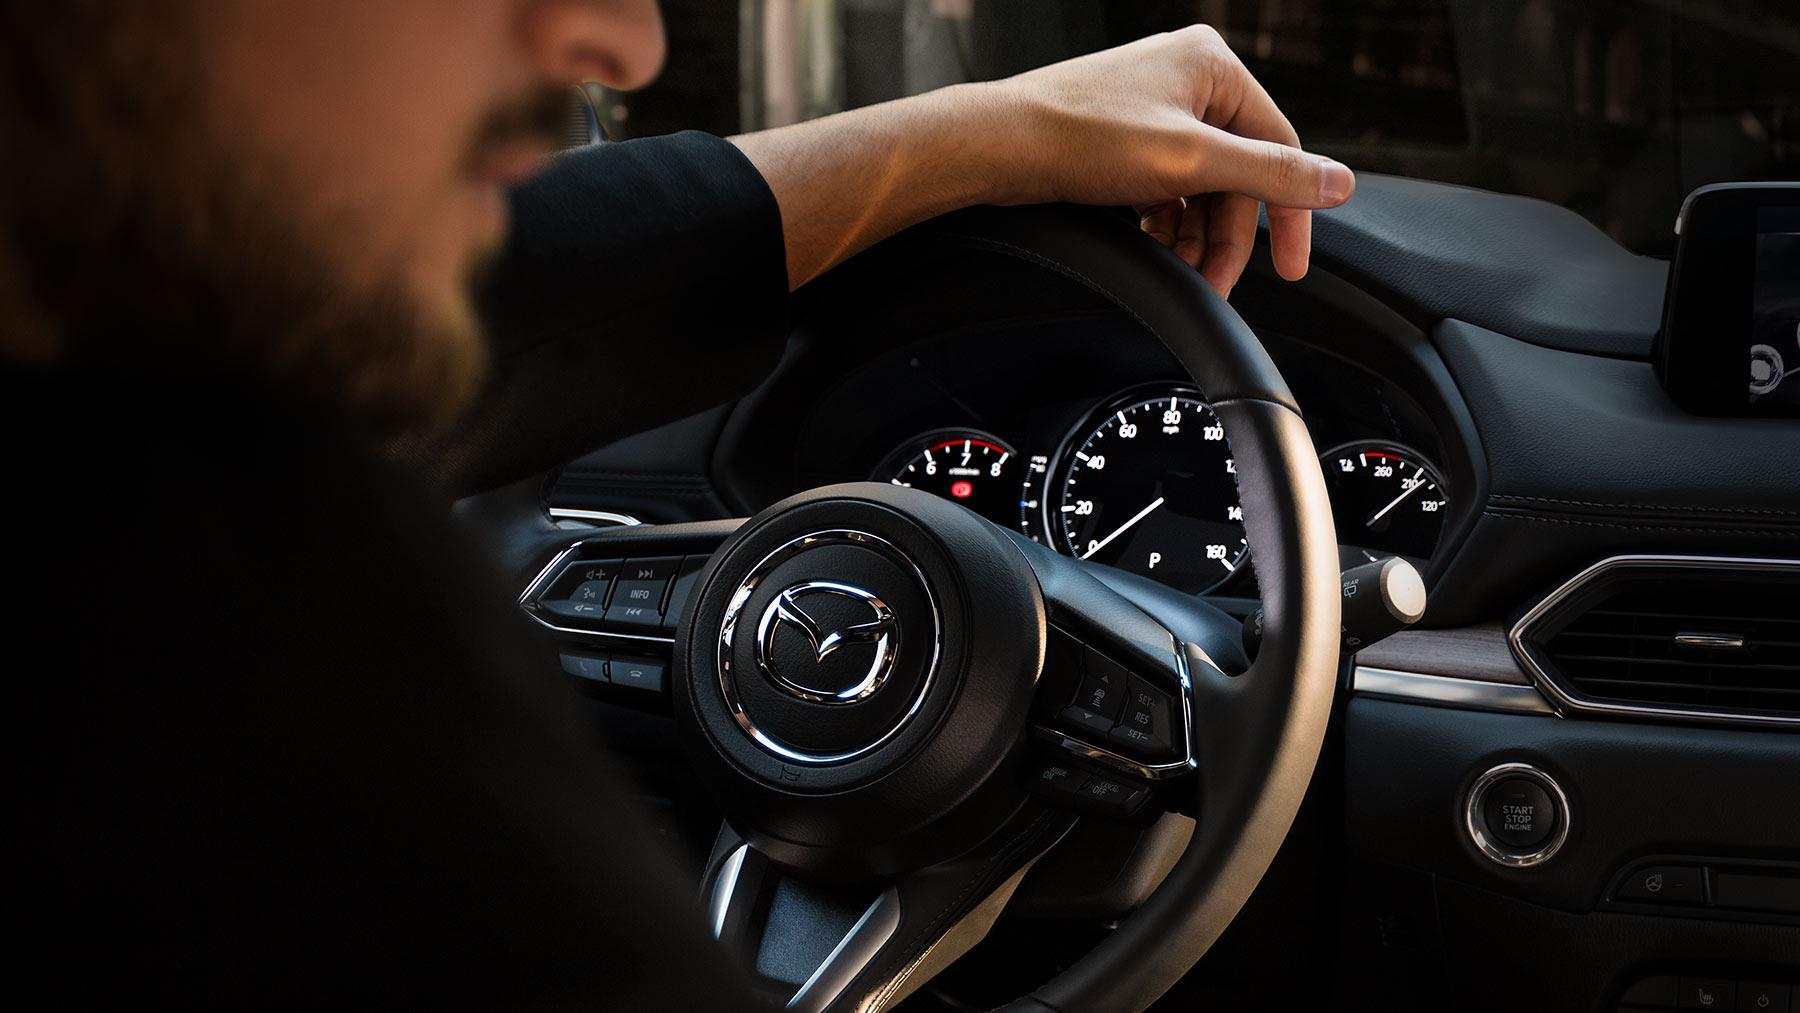 Steering Wheel of the 2019 Mazda CX-5